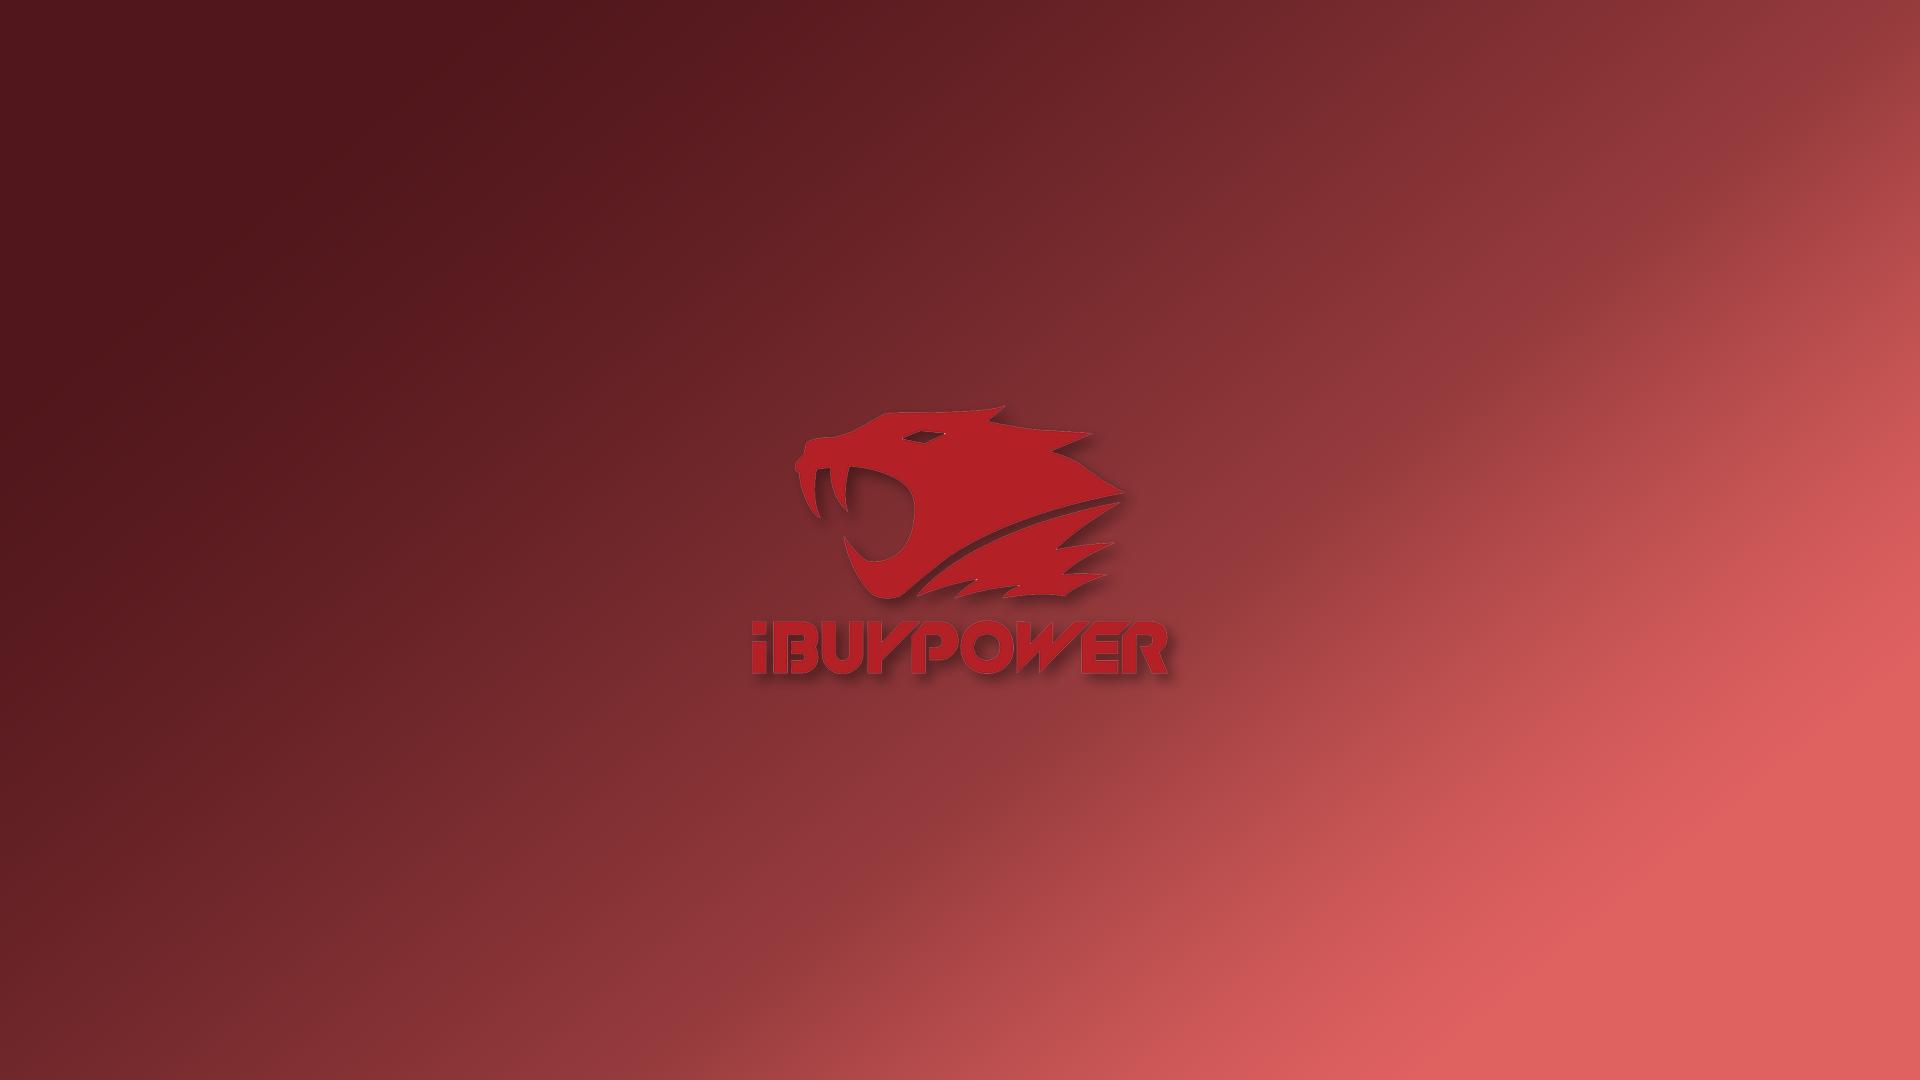 CSGO lite Ibuypower